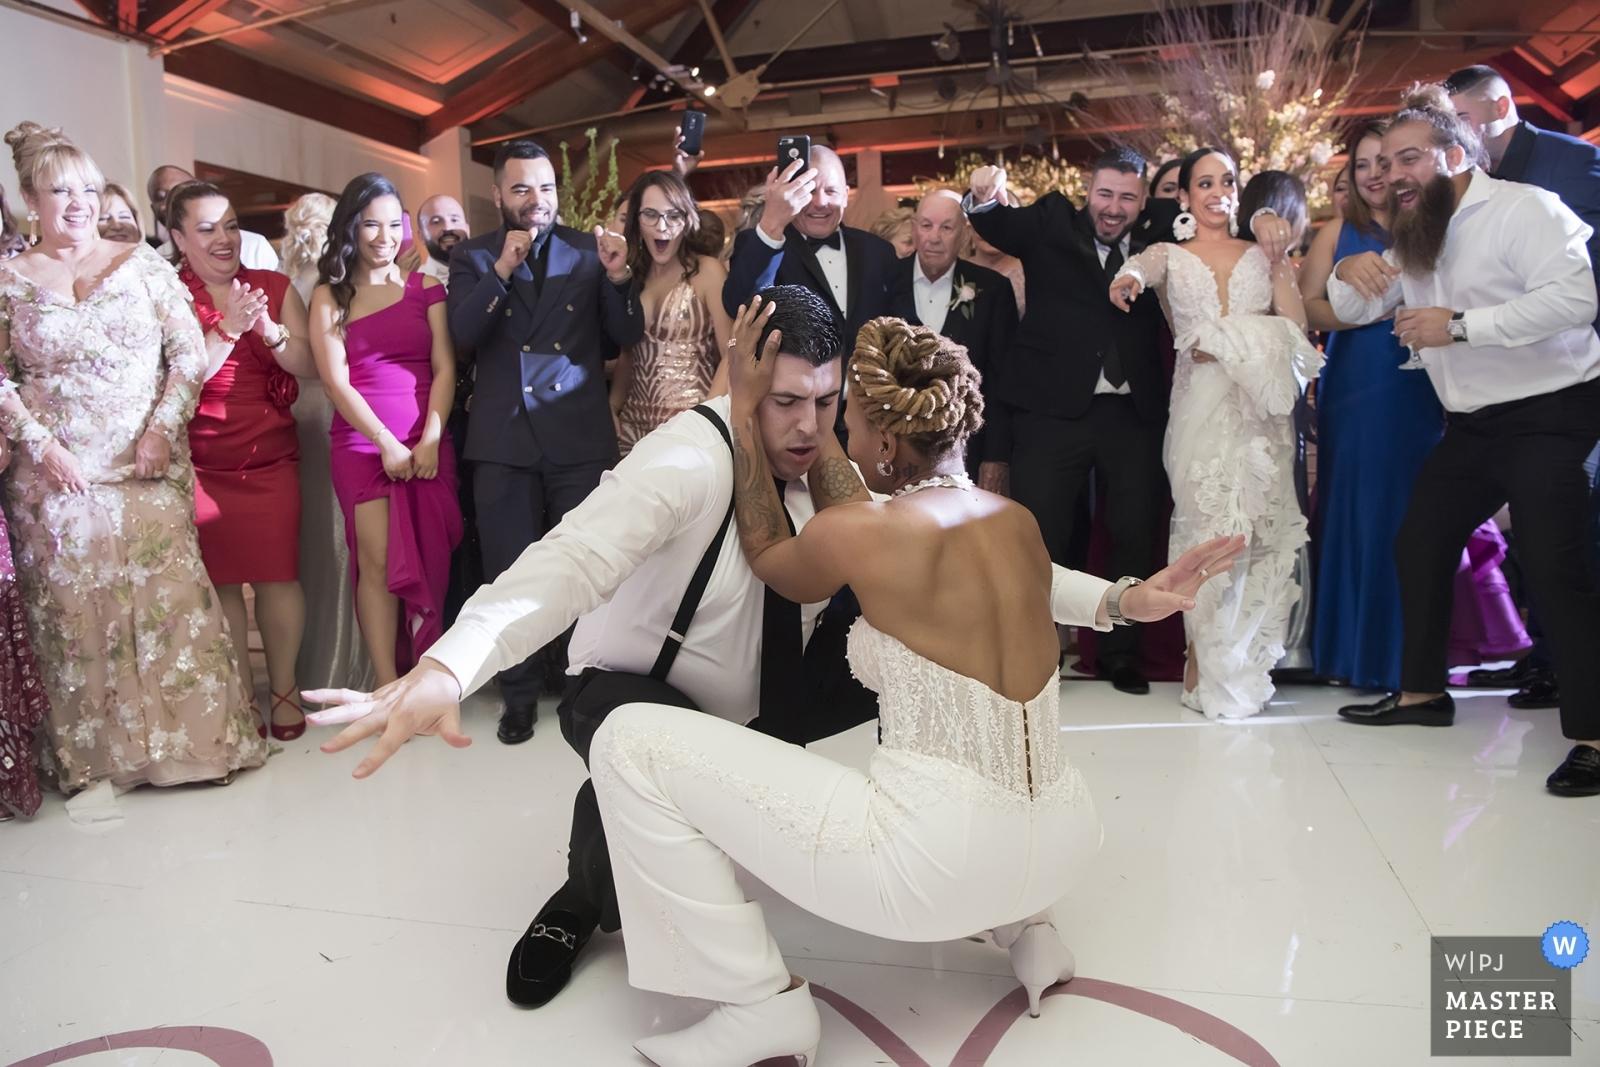 people dancing at wedding reception - Hoboken, New Jersey Wedding Photography -  | Liberty House